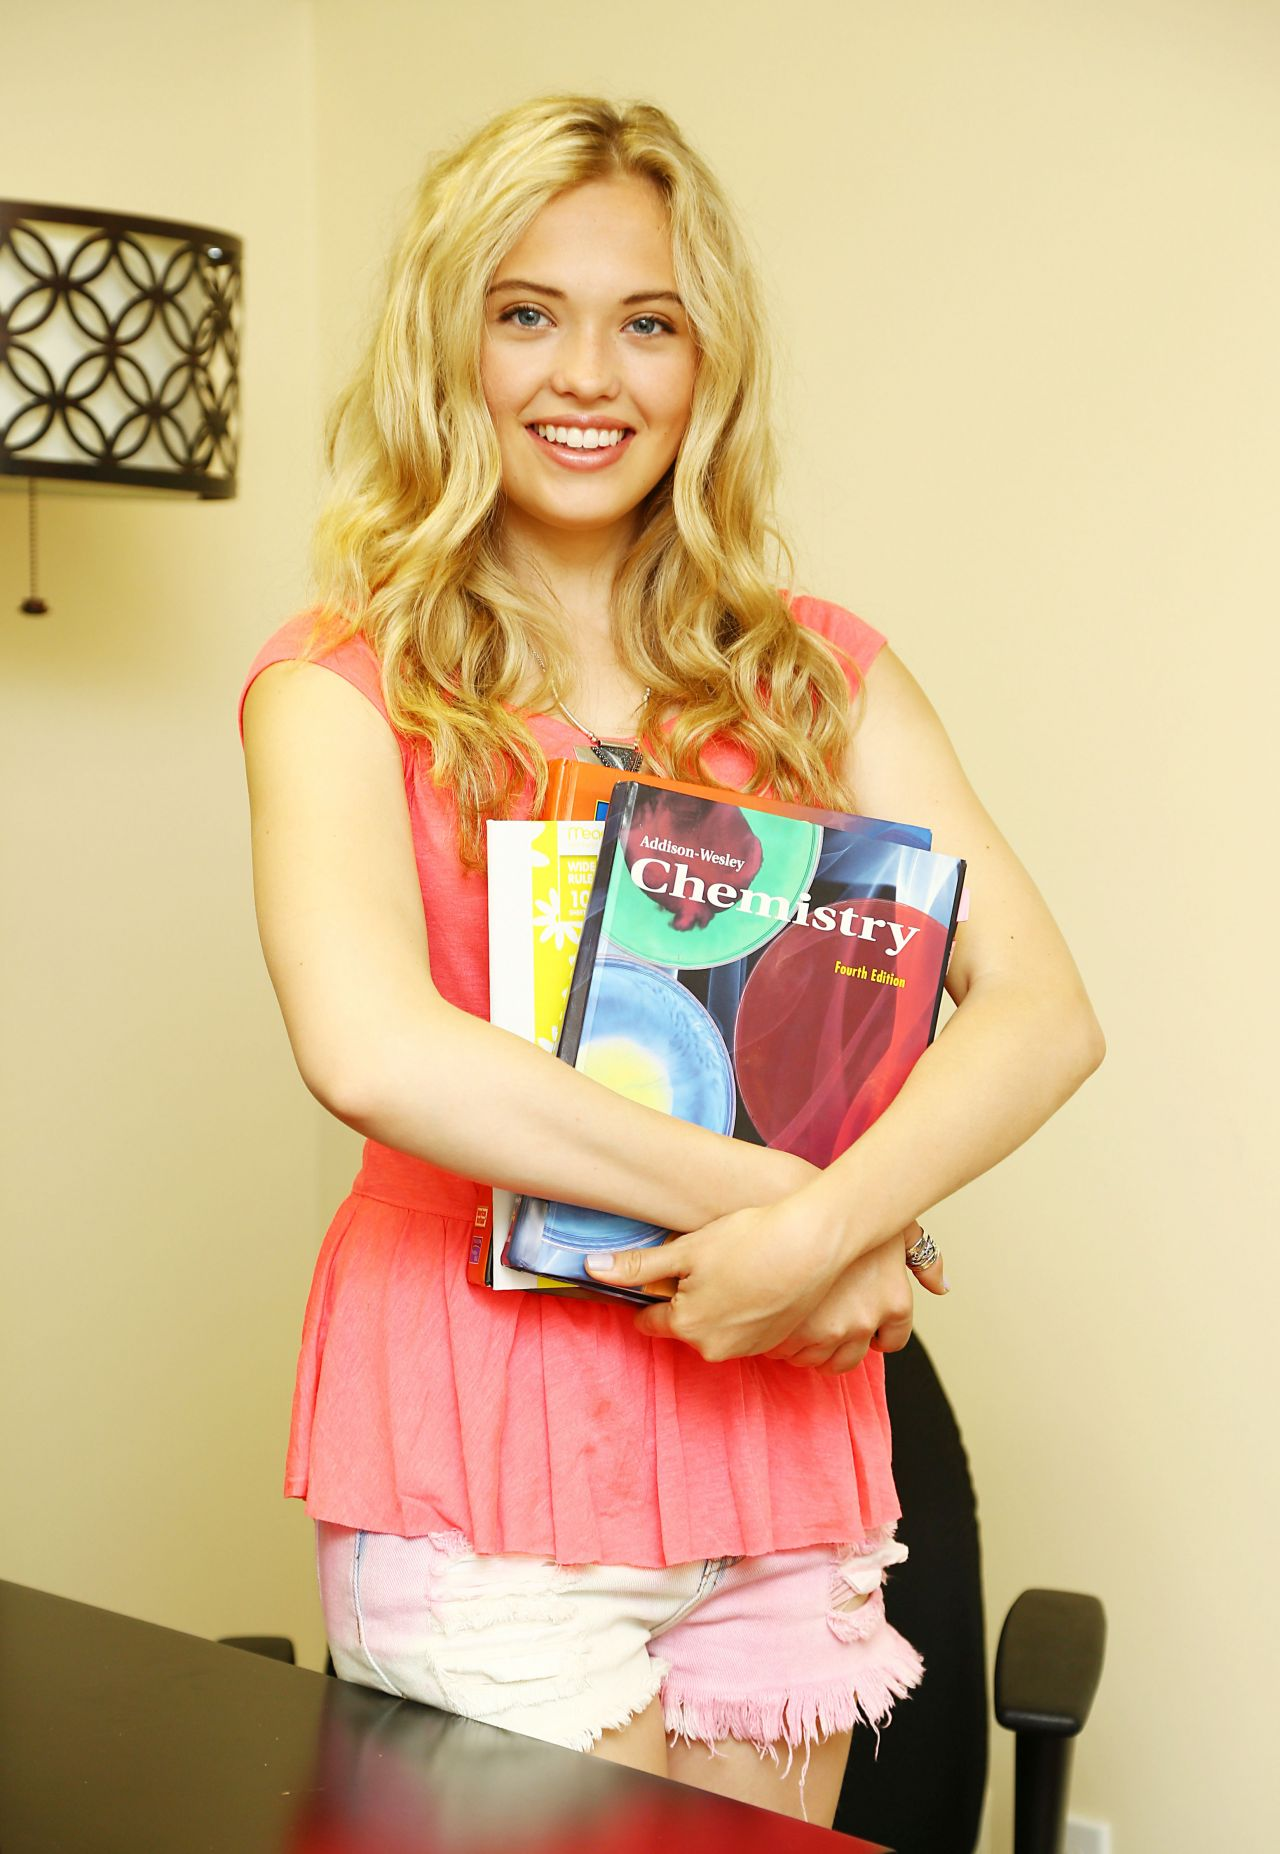 Lauren Taylor Photoshoot In Los Angeles July 2015